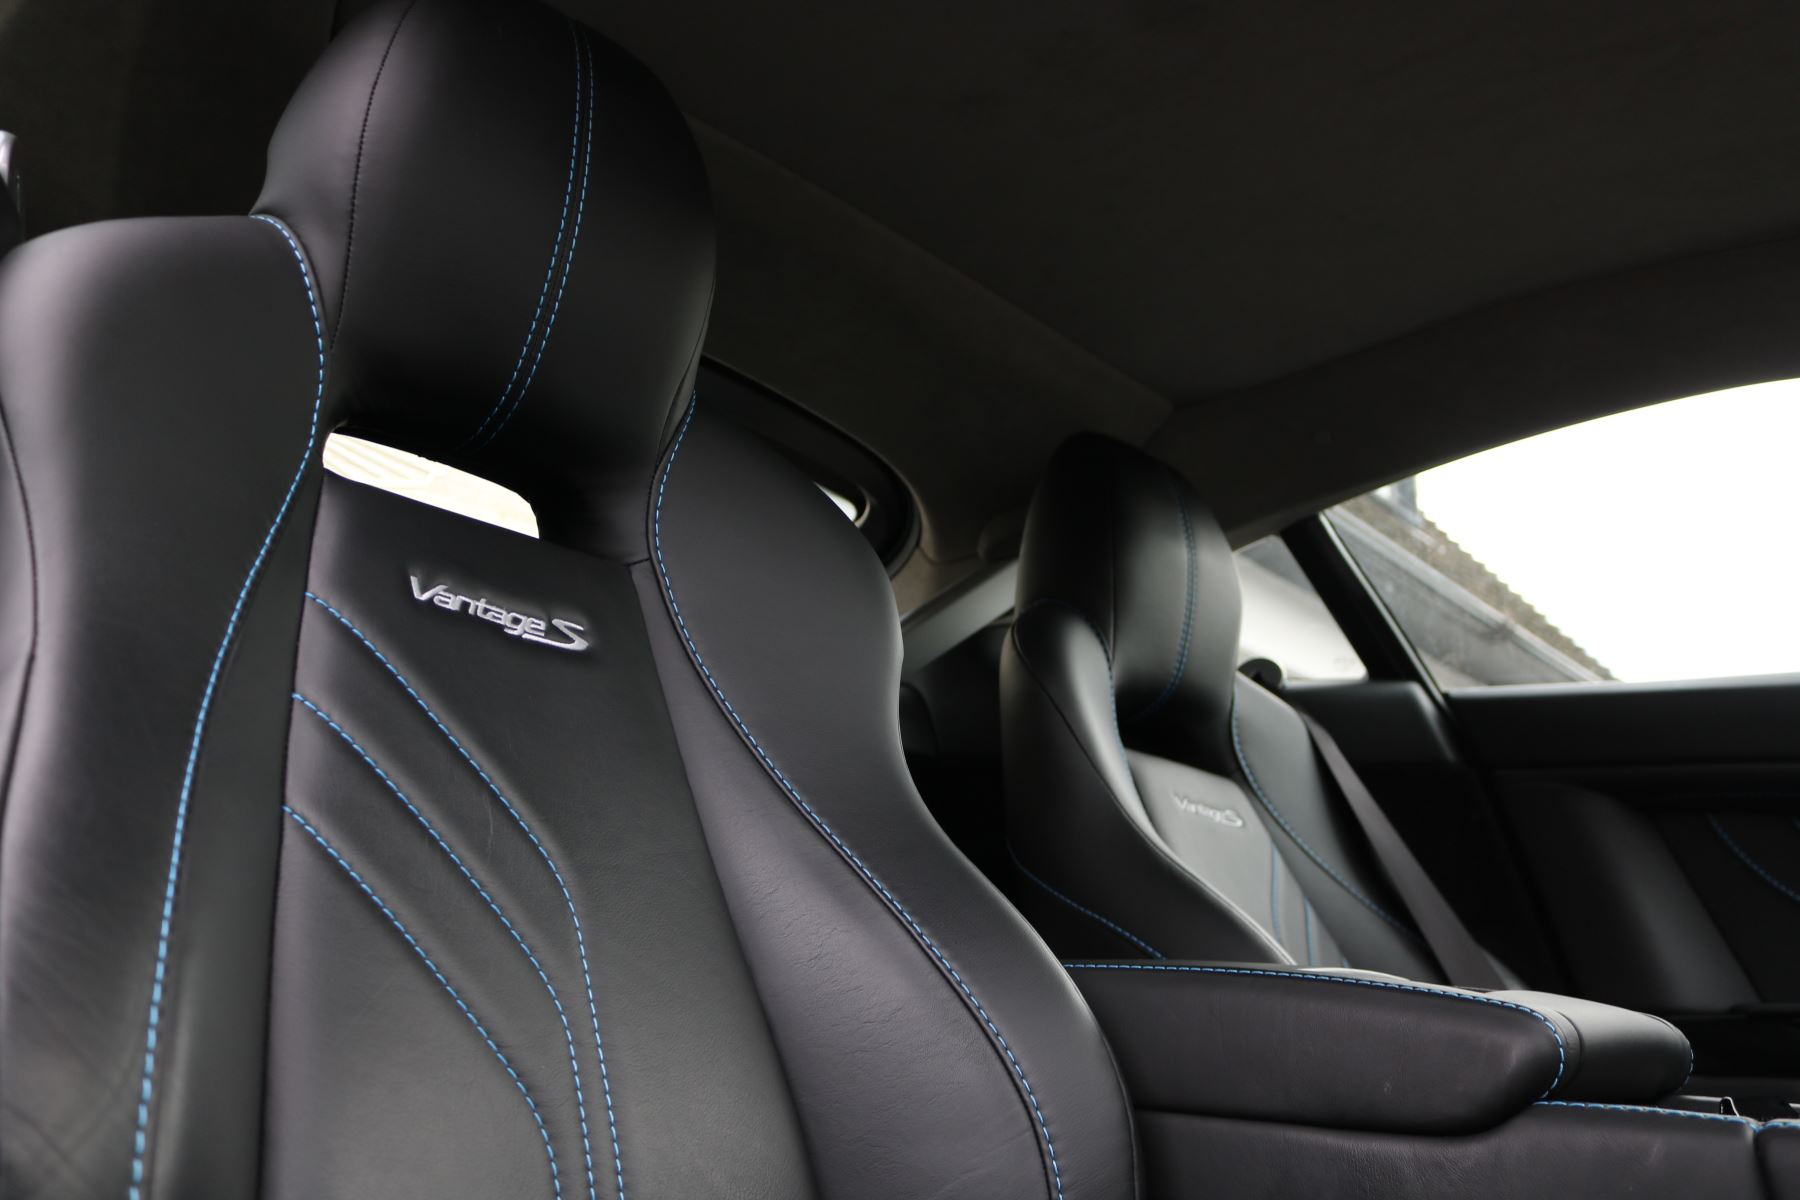 Aston Martin V8 Vantage S S 2dr Sportshift image 23